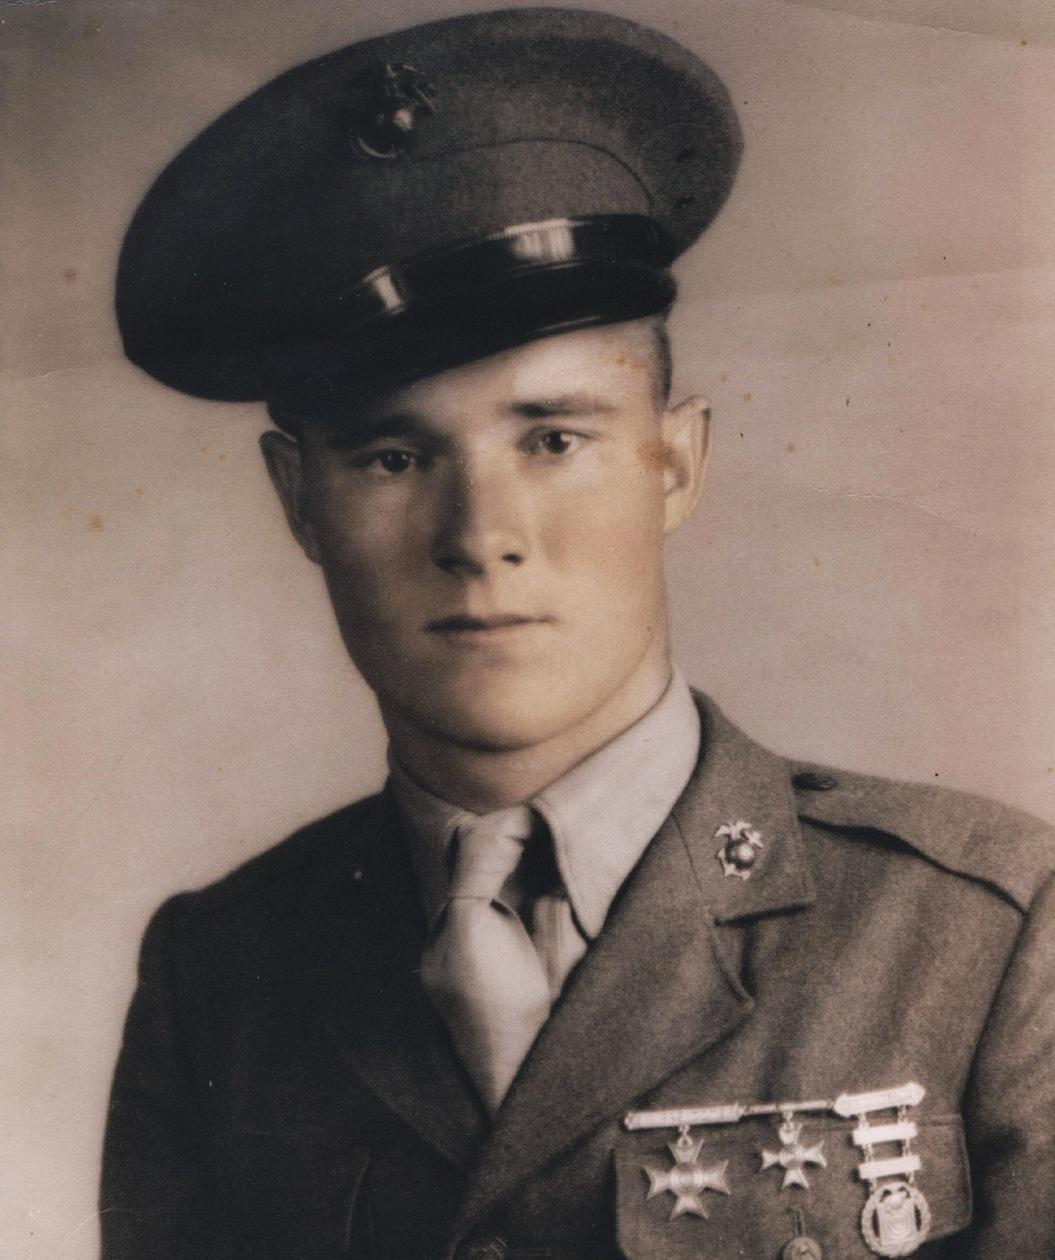 RV Burgin wwii soldier military portrait full uniform